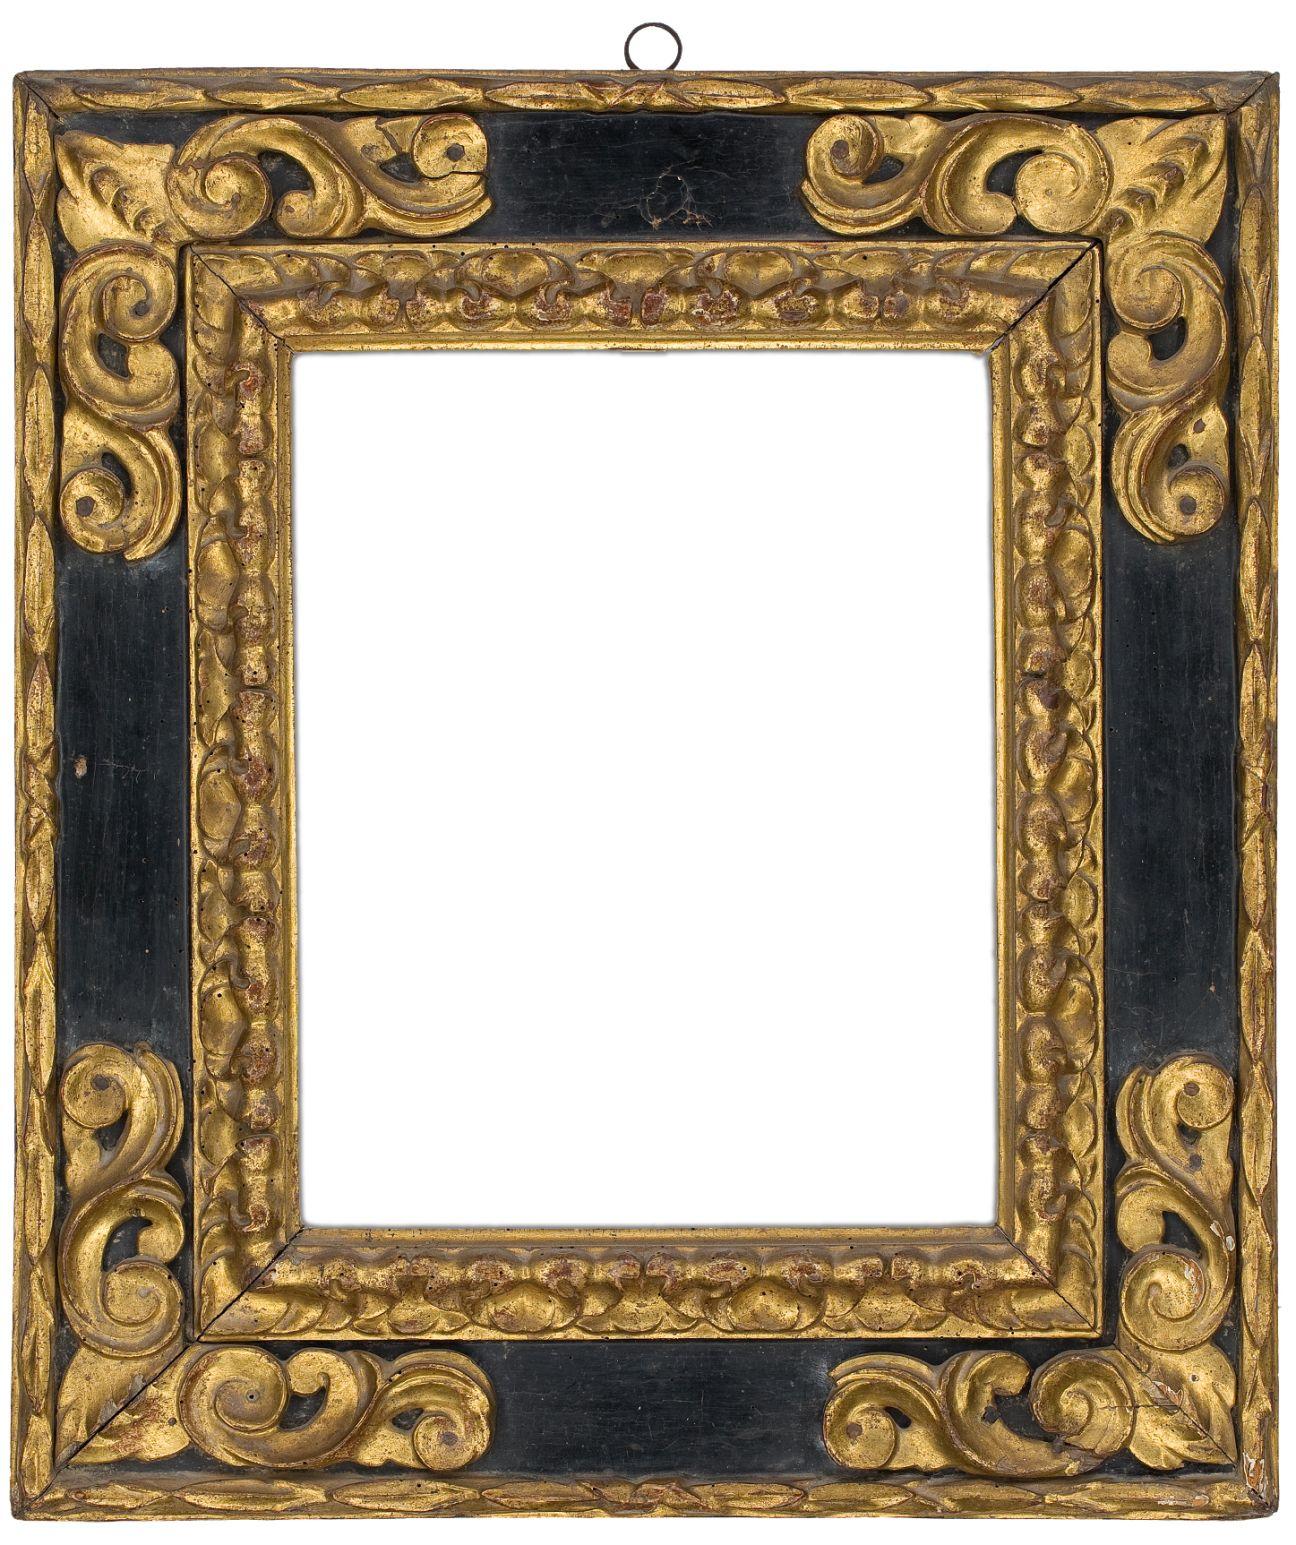 Pin By Shari Micnener On Homemade Home Decor Antique Picture Frames Picture Frame Decor Frame